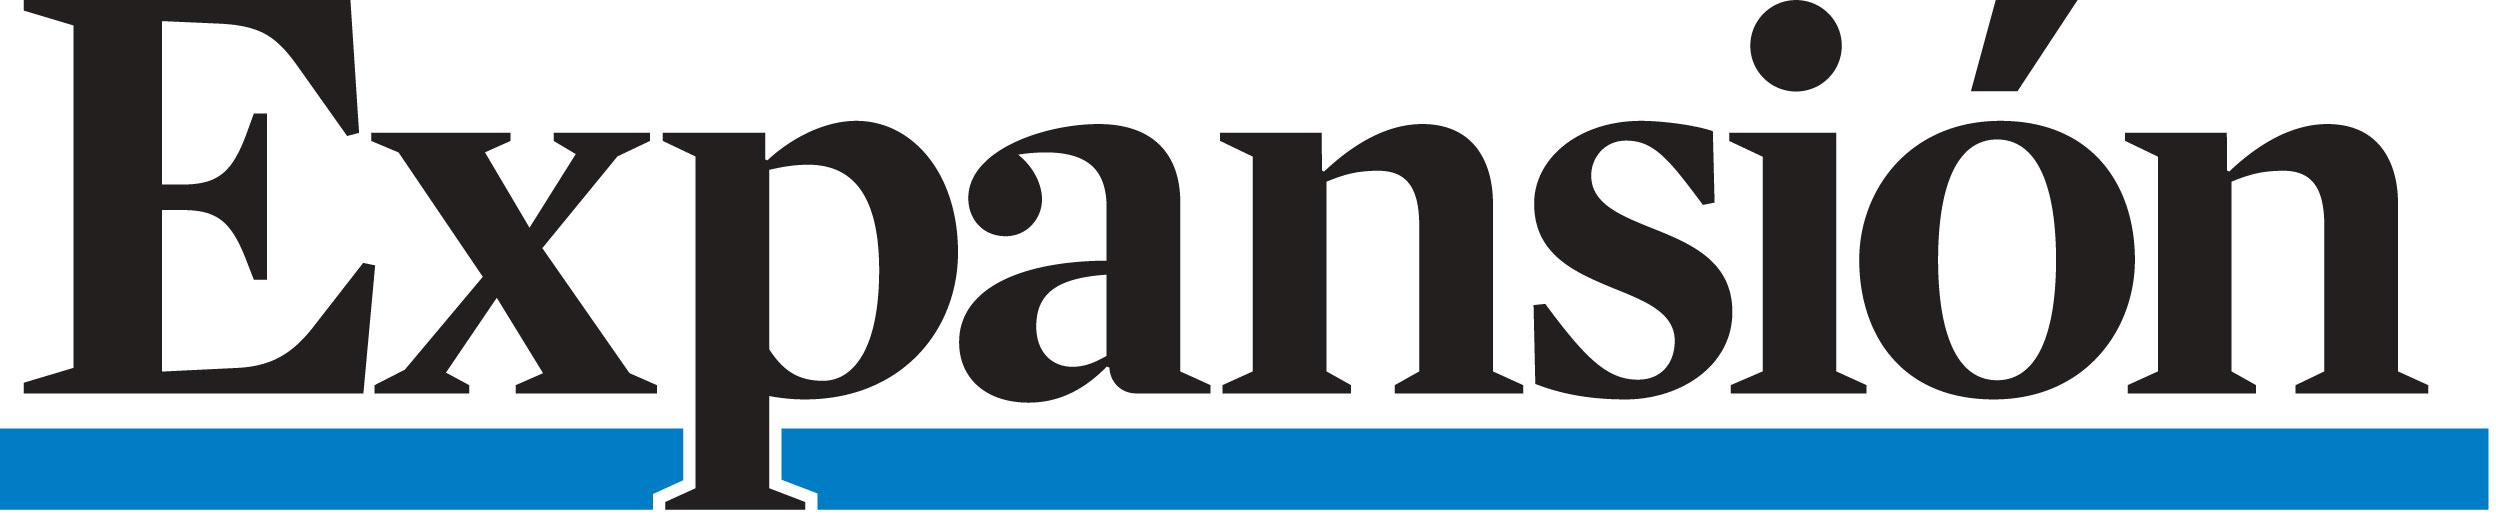 http://www.ajemadrid.es/wp-content/uploads/logo_expansion.jpg